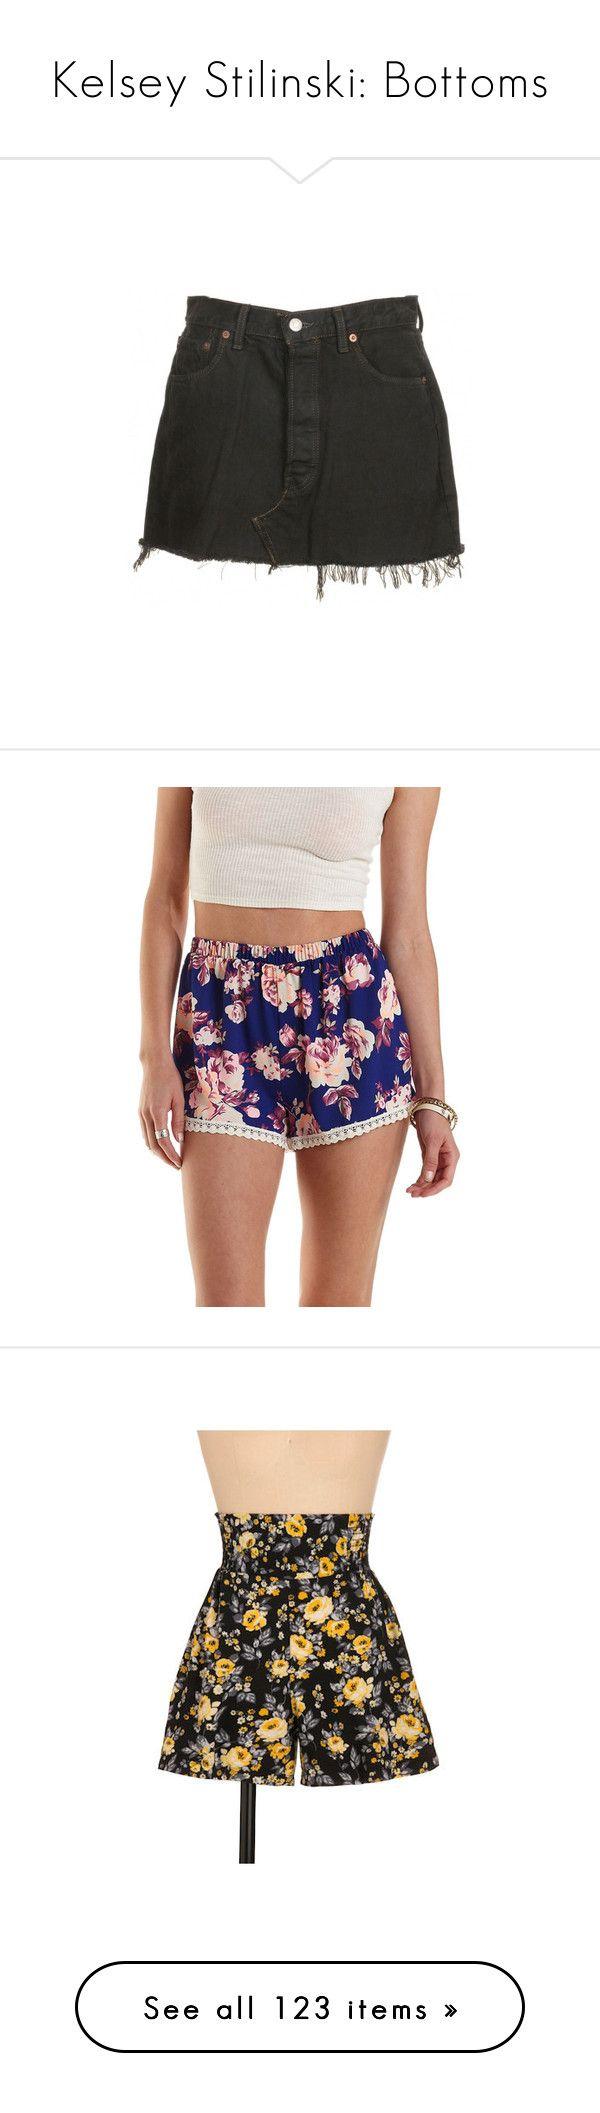 """Kelsey Stilinski: Bottoms"" by nerdbucket ❤ liked on Polyvore featuring skirts, mini skirts, bottoms, shorts, faldas, levi skirts, vintage mini skirt, denim mini skirt, vintage skirts and vintage denim skirt"